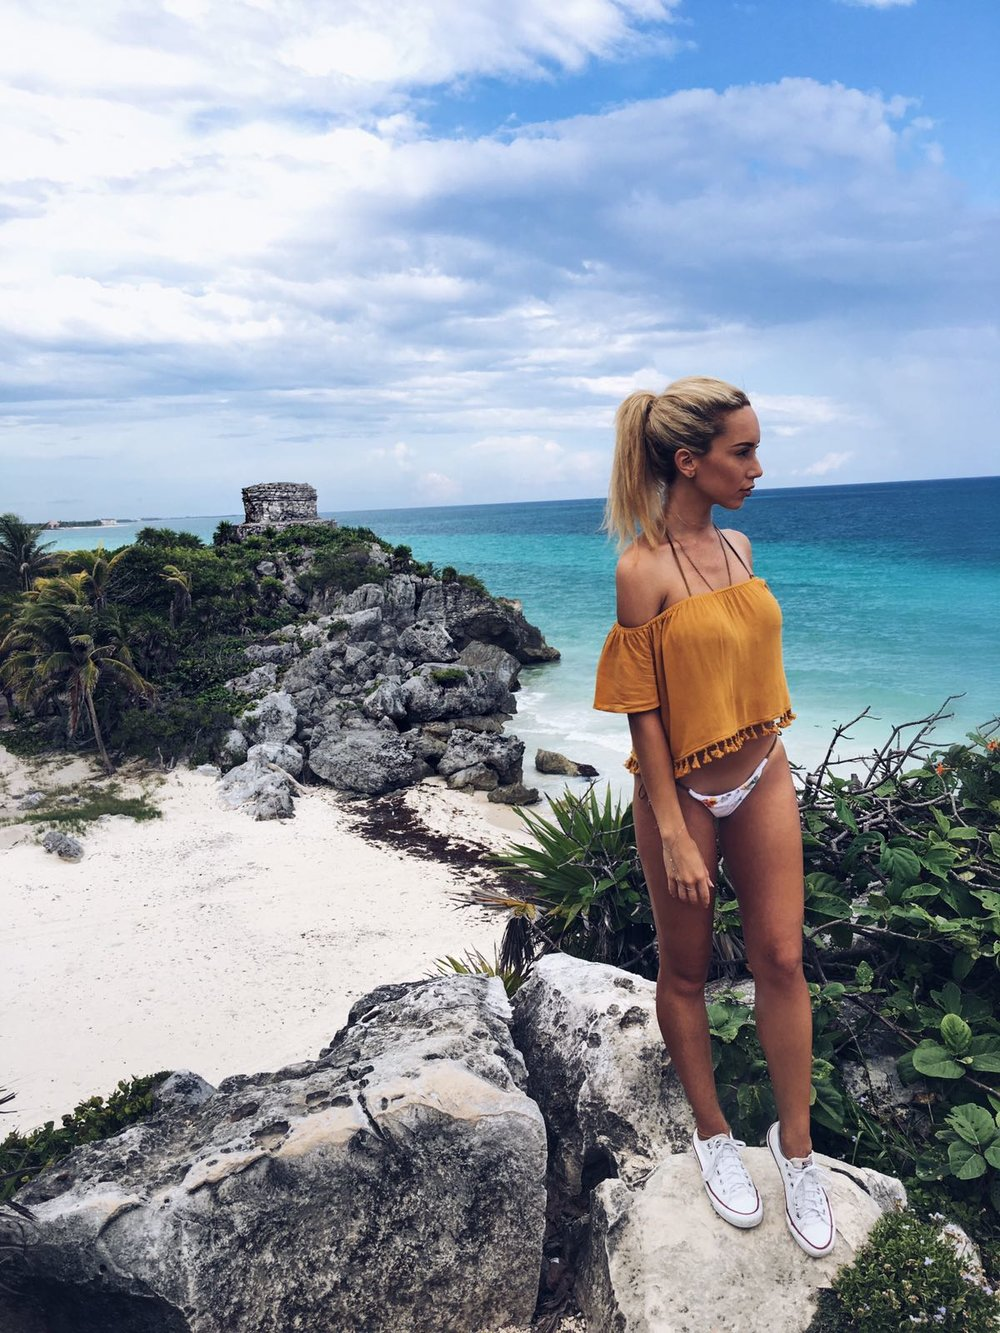 Checking out the ancient Mayan Ruins